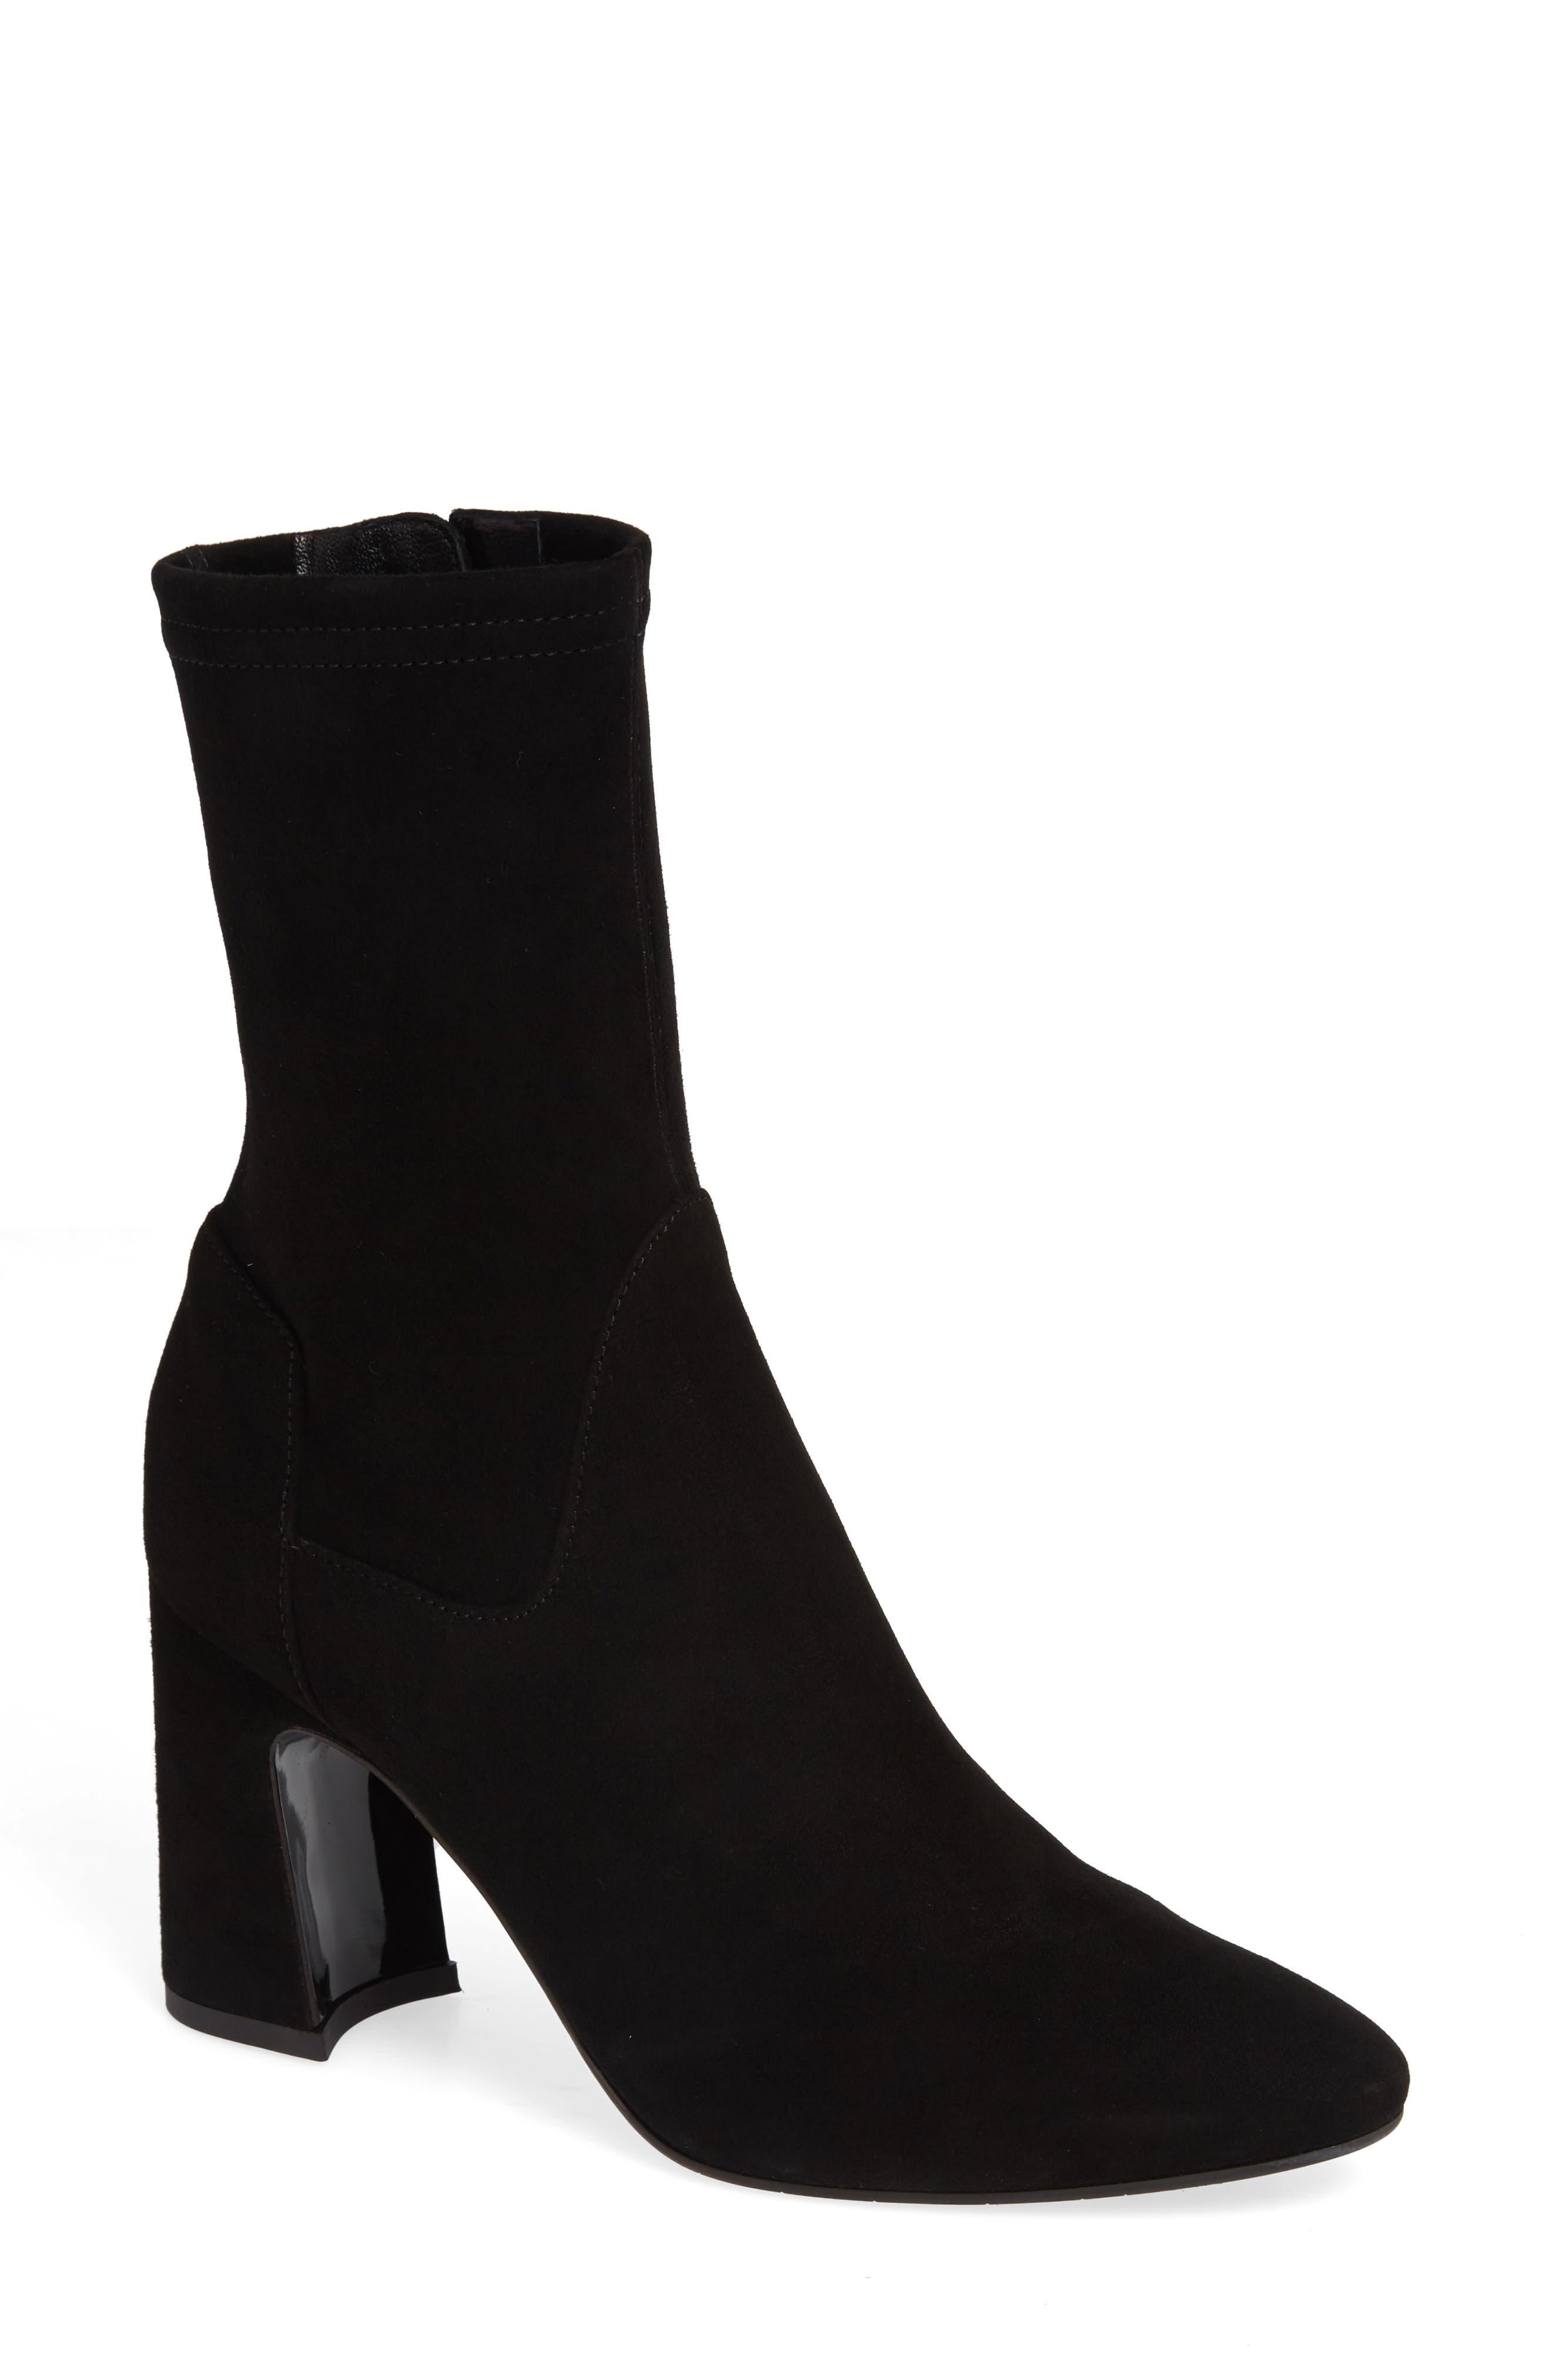 Aquatalia Nastasia Stretch Suede Boot, Black